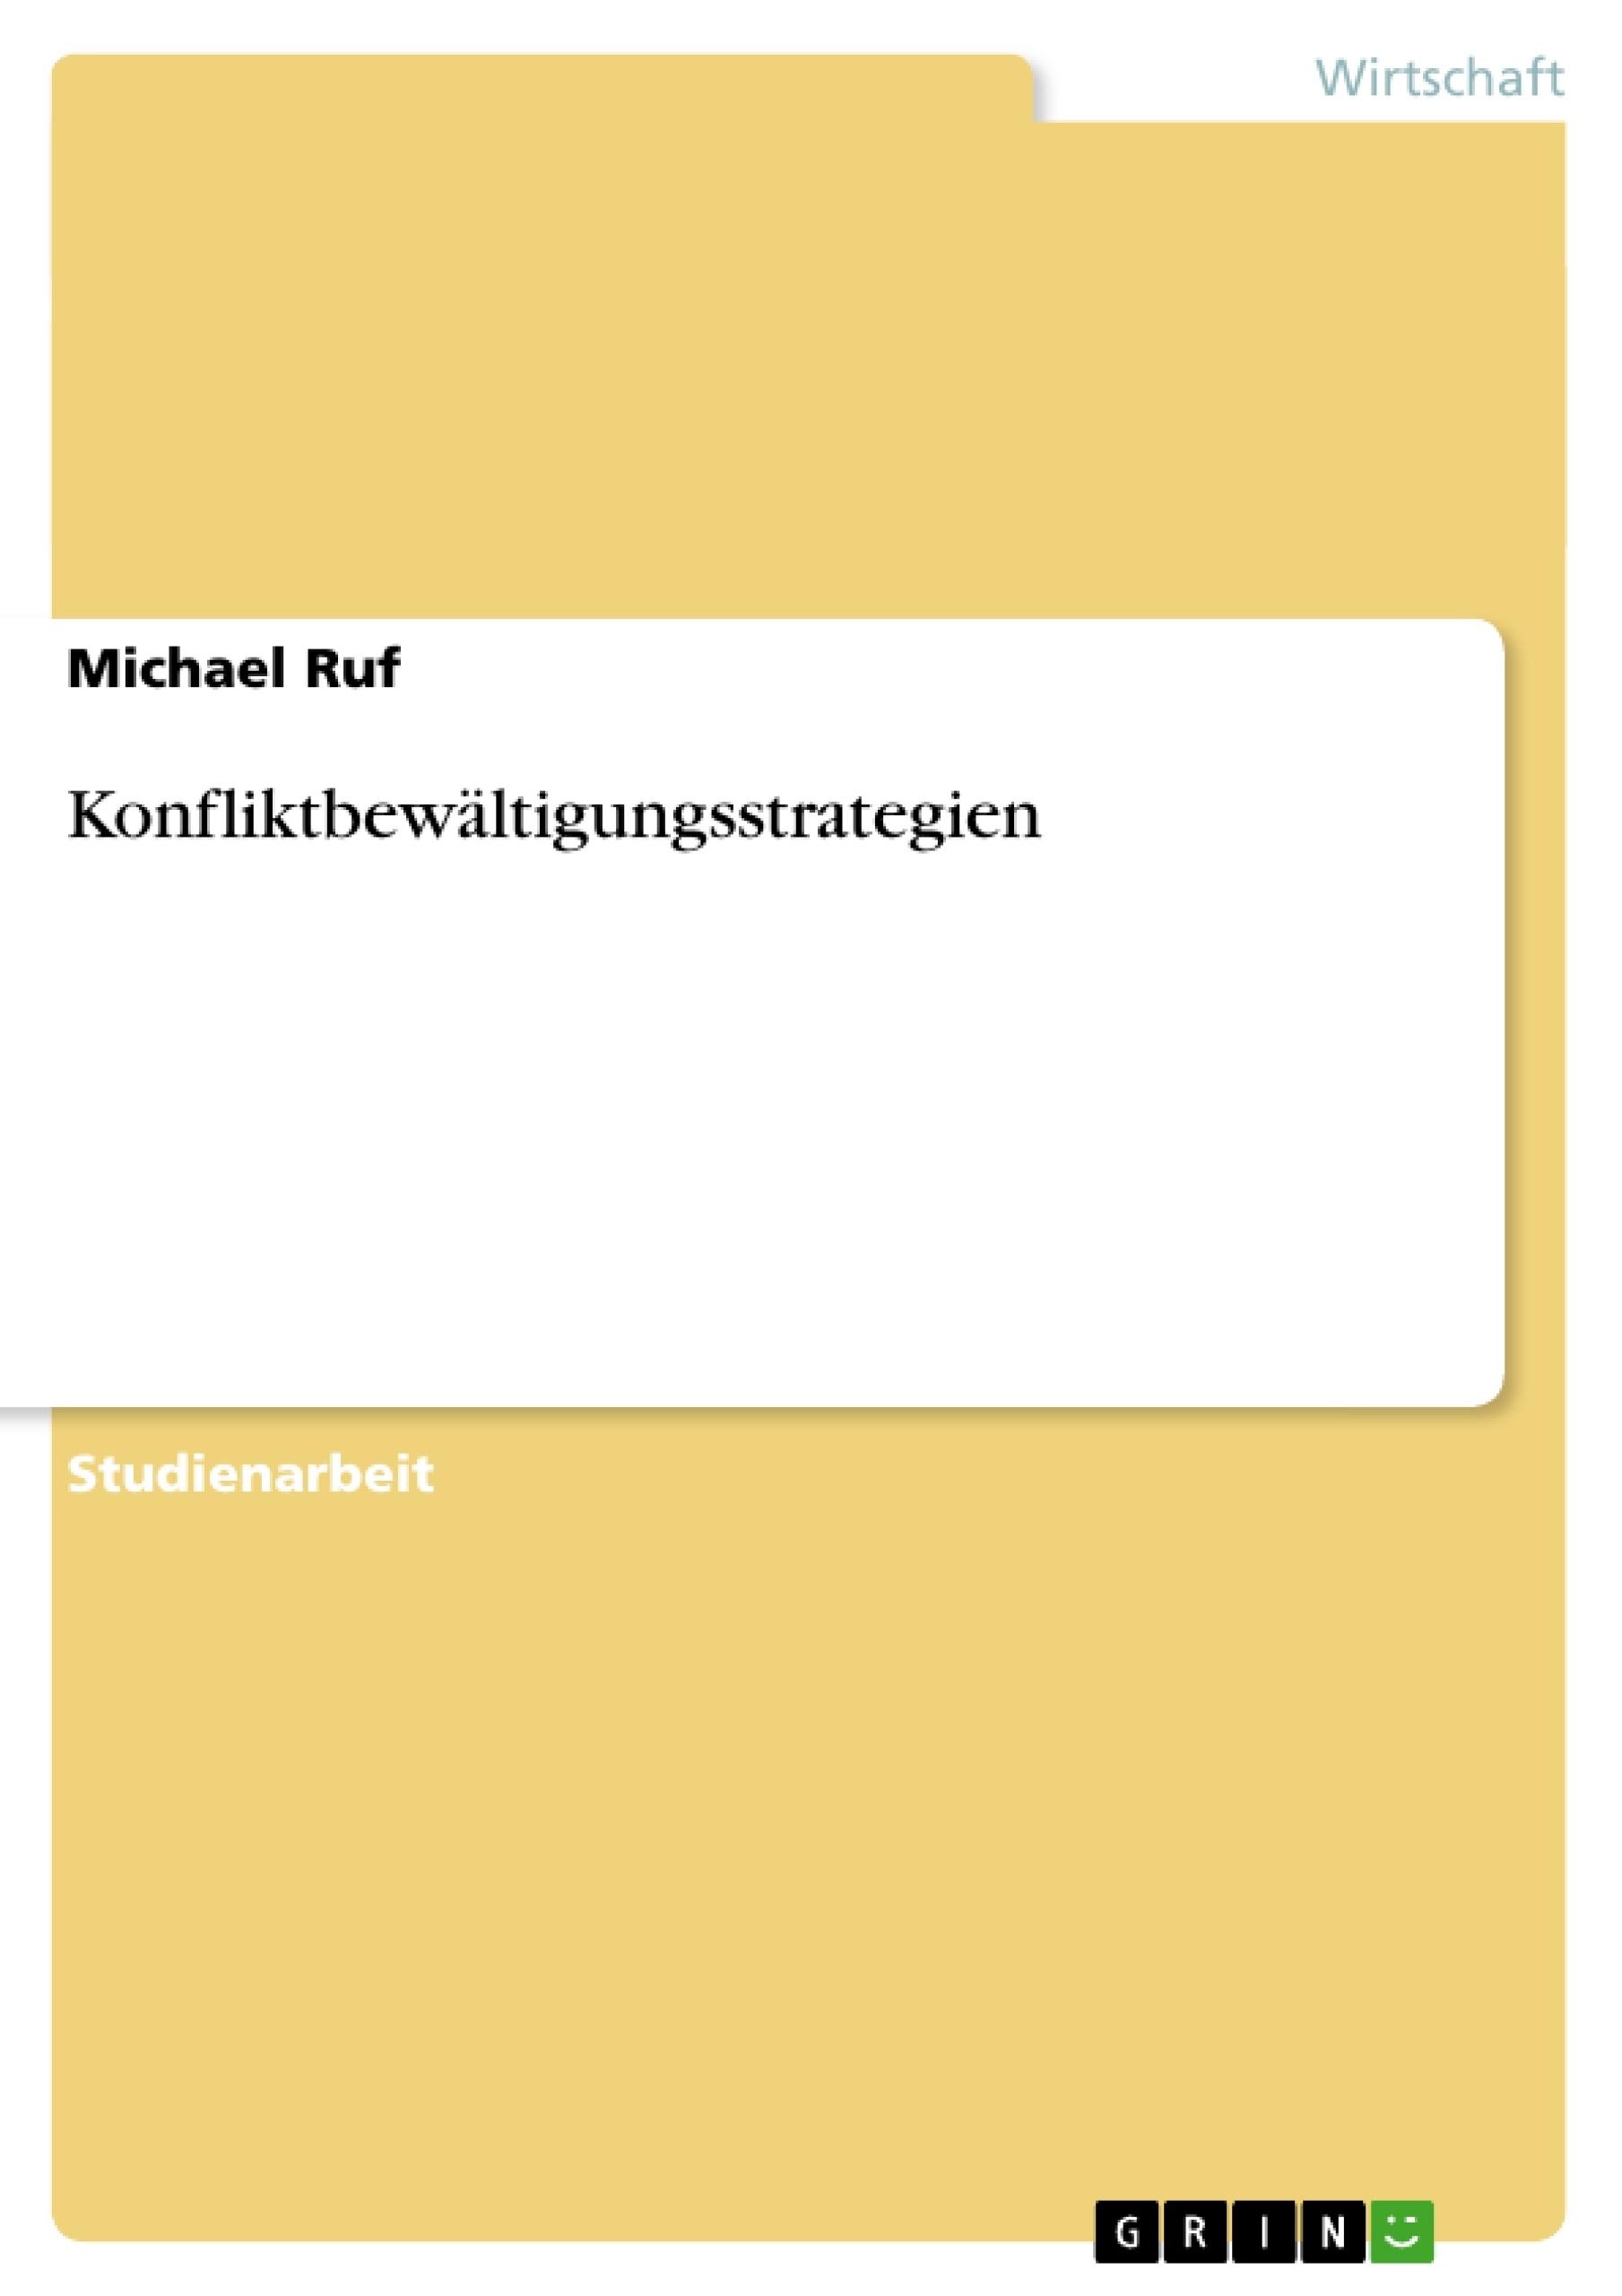 Titel: Konfliktbewältigungsstrategien